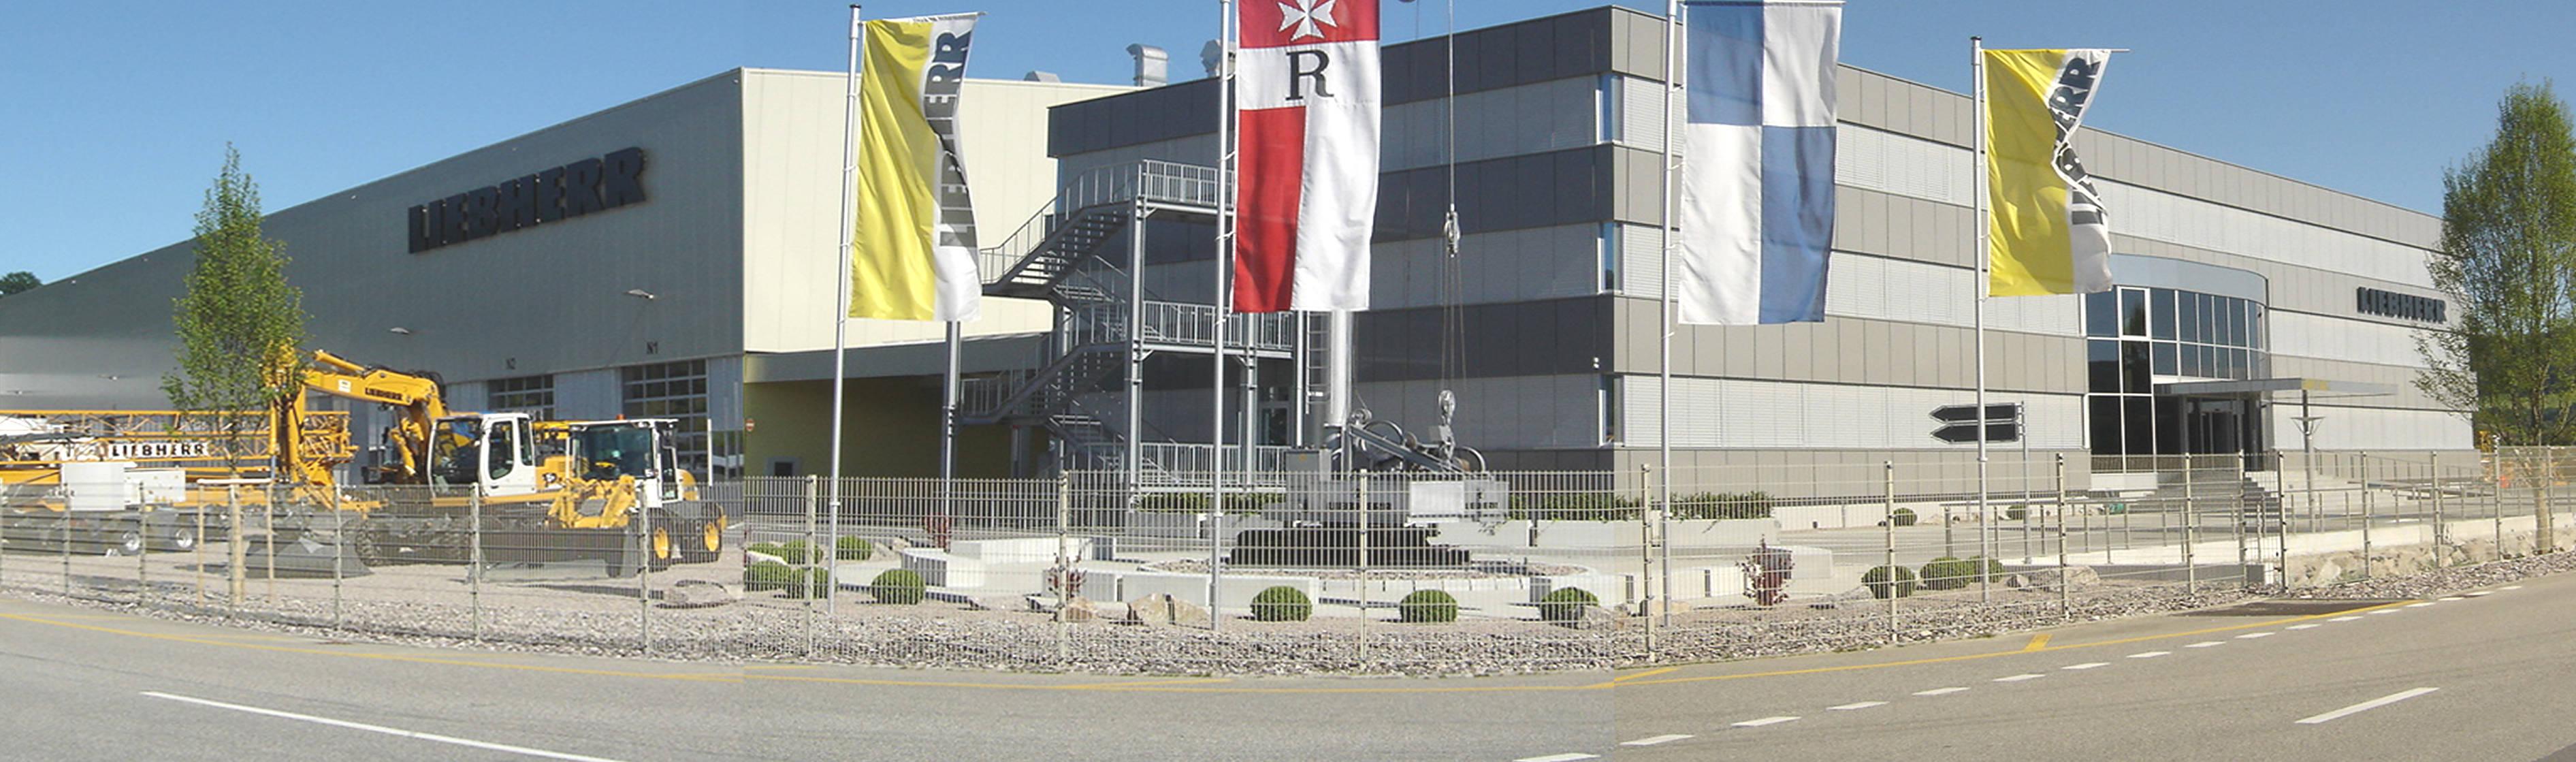 Brun & Mahler GmbH